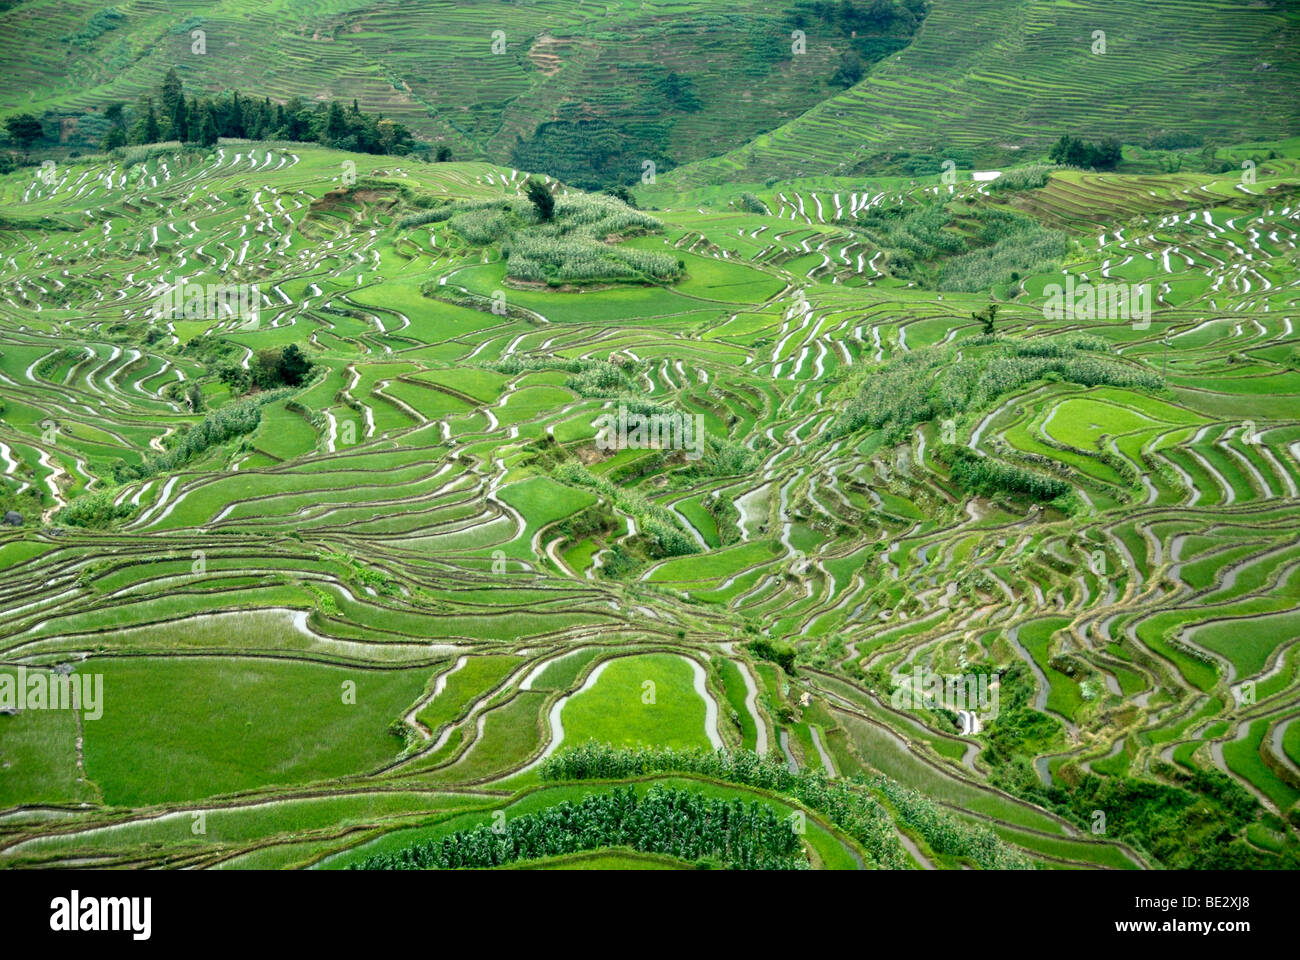 Green rice fields on the hillside, terraced rice fields, Yuanyang, in Xinji, Yunnan Province, People's Republic - Stock Image